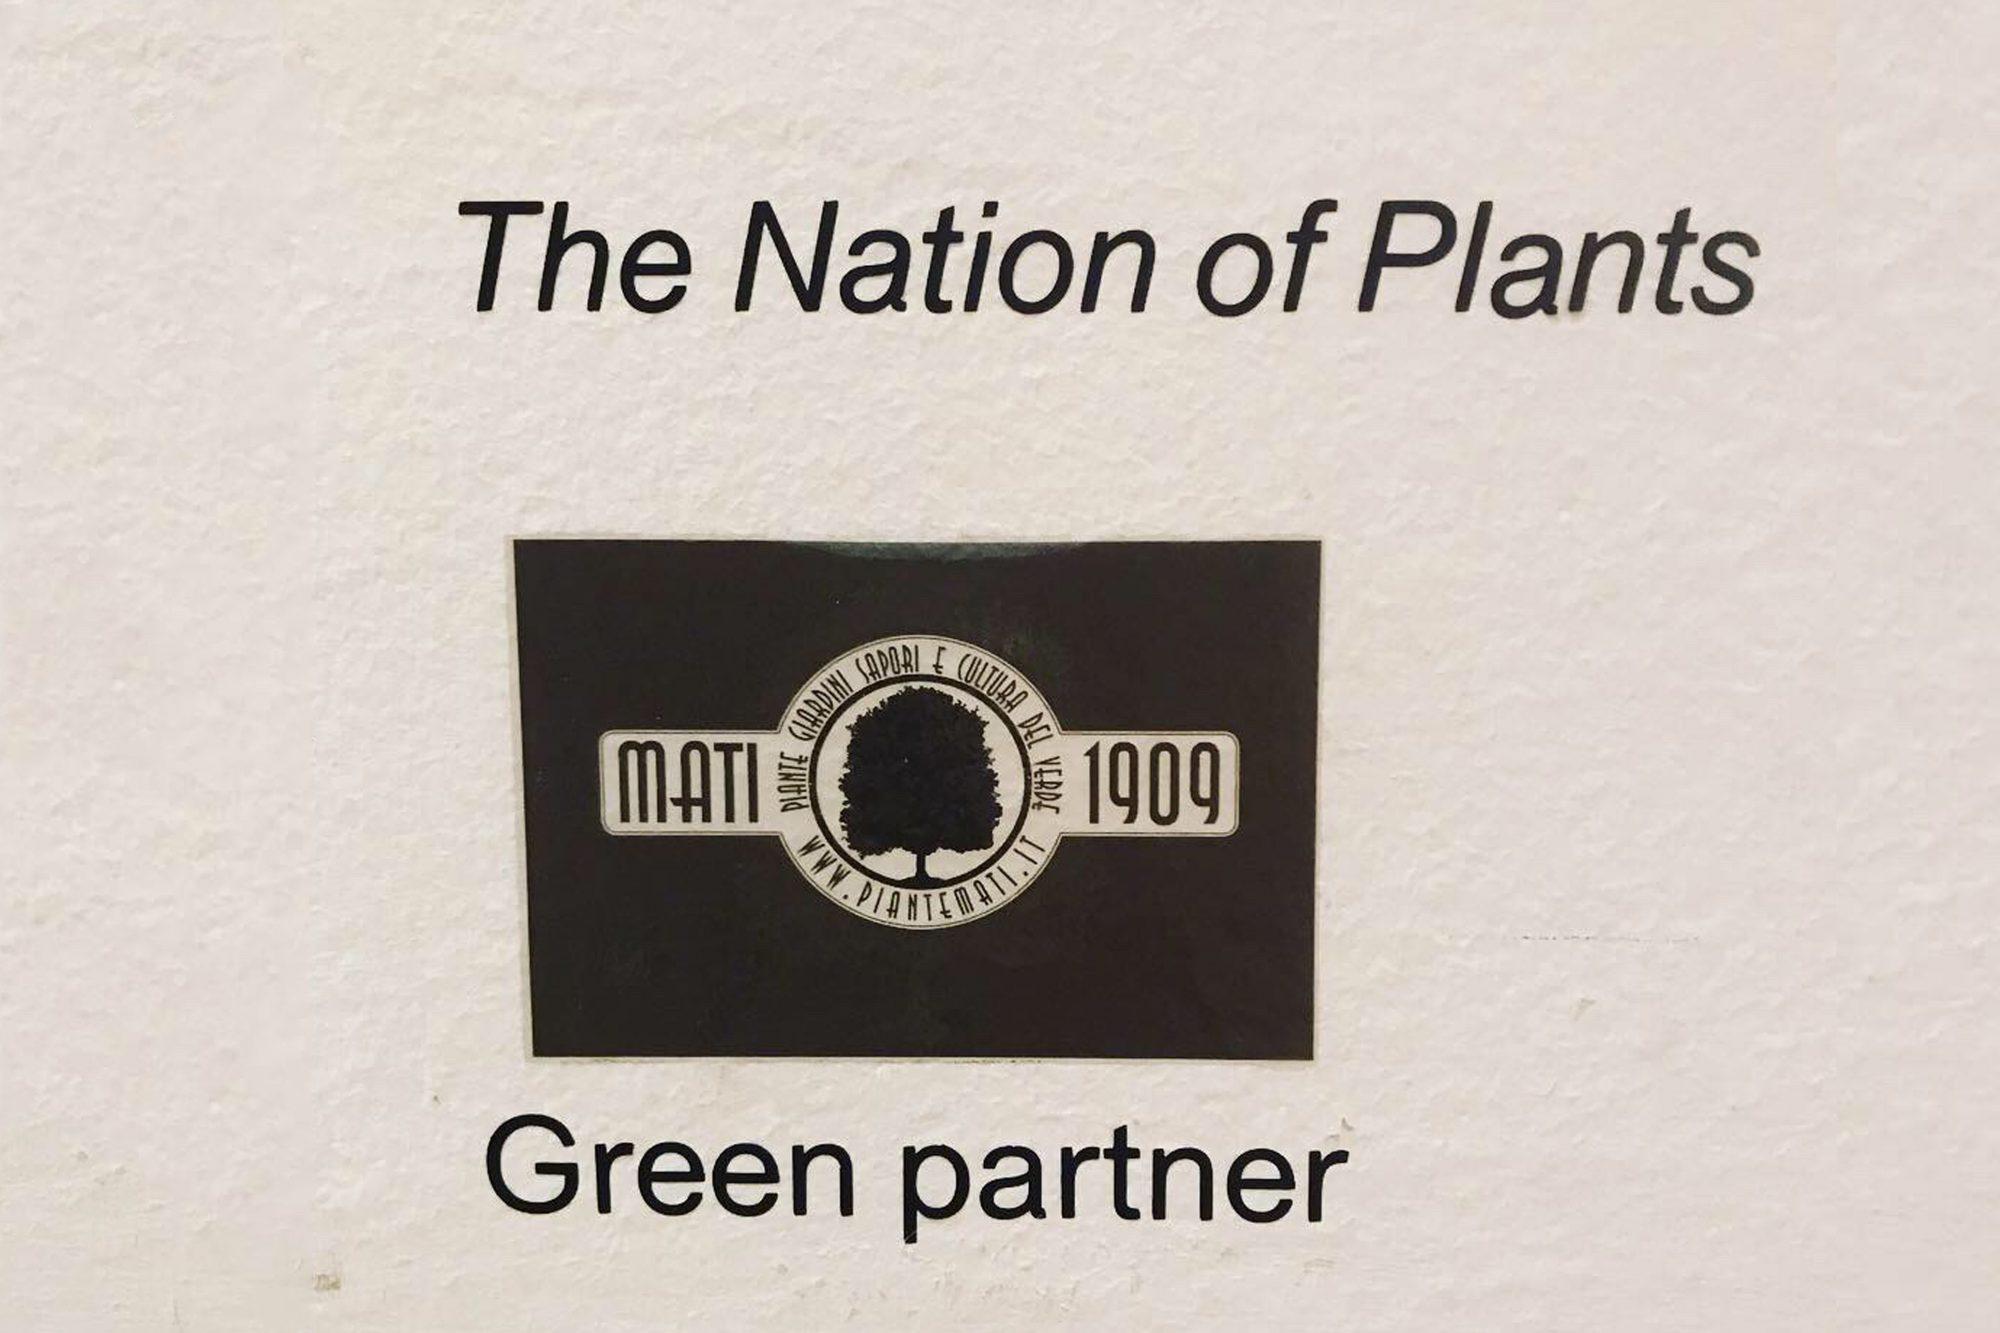 MATI-1909-green-partner